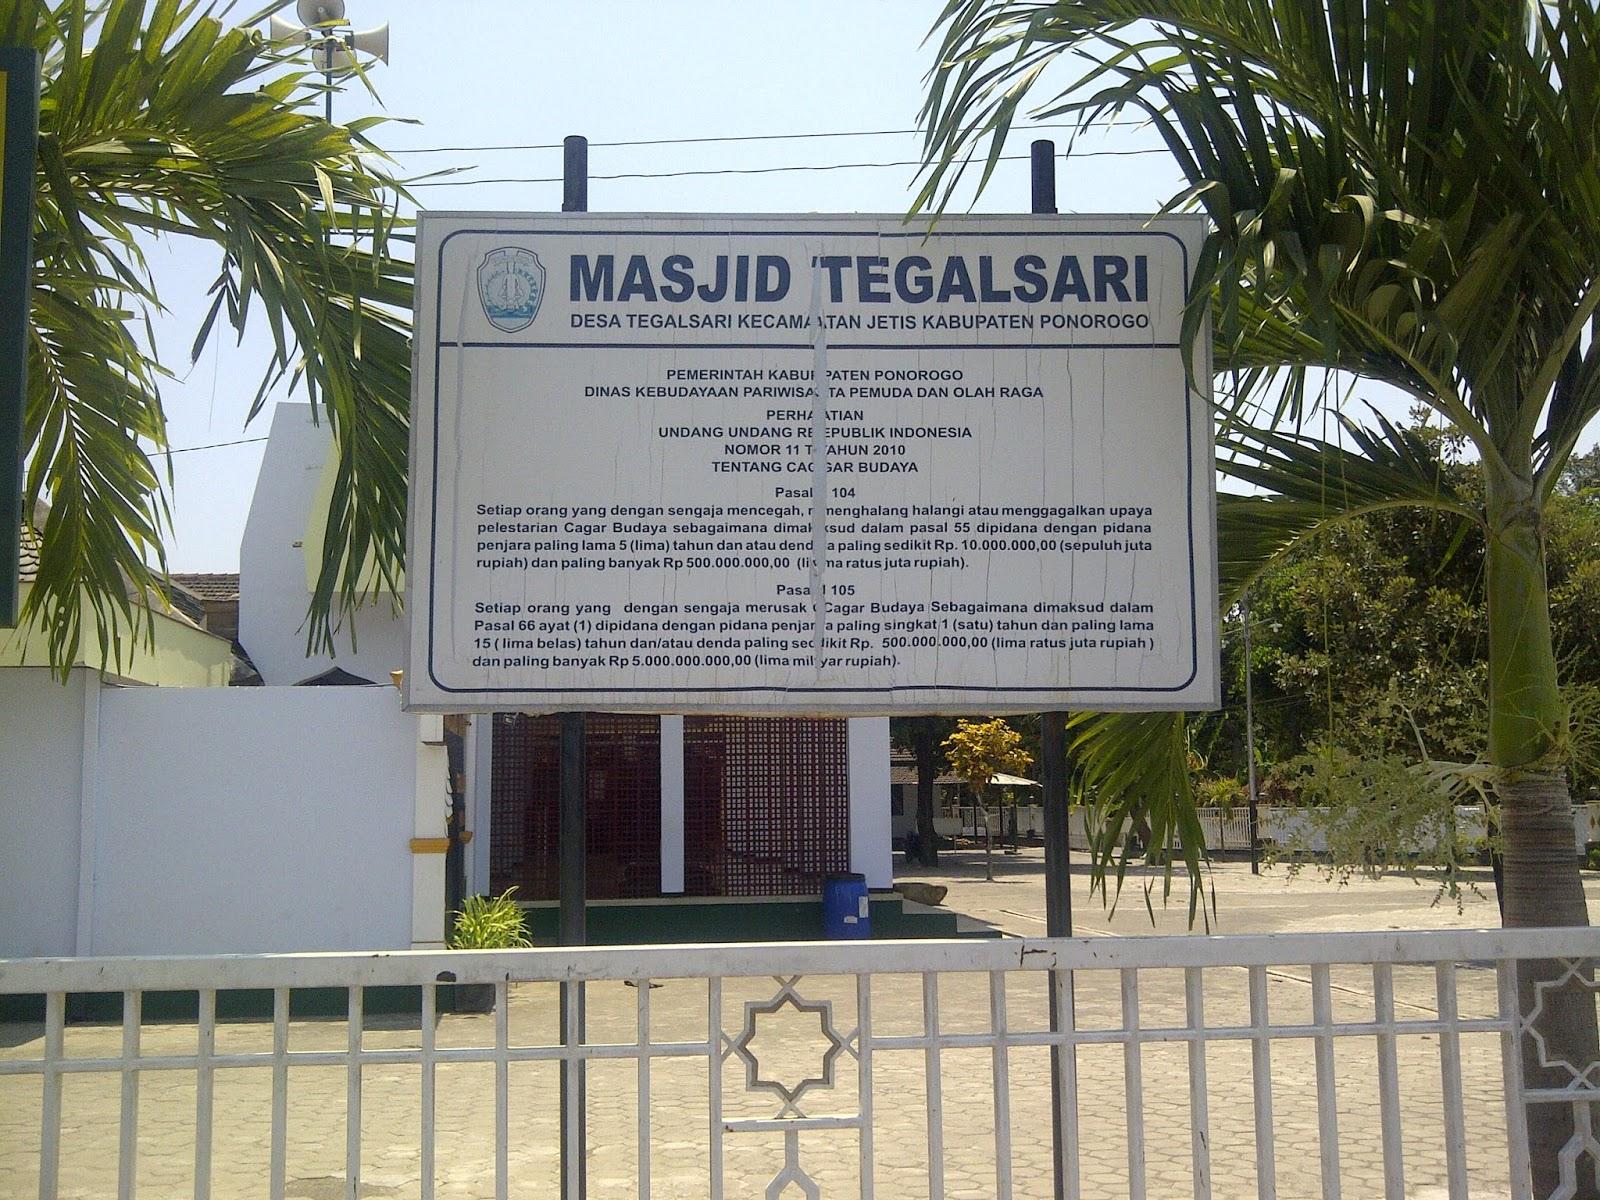 Masjid Tegalsari Wisata Religi Ponorogo Ayo Nge Trip Terletak Desa